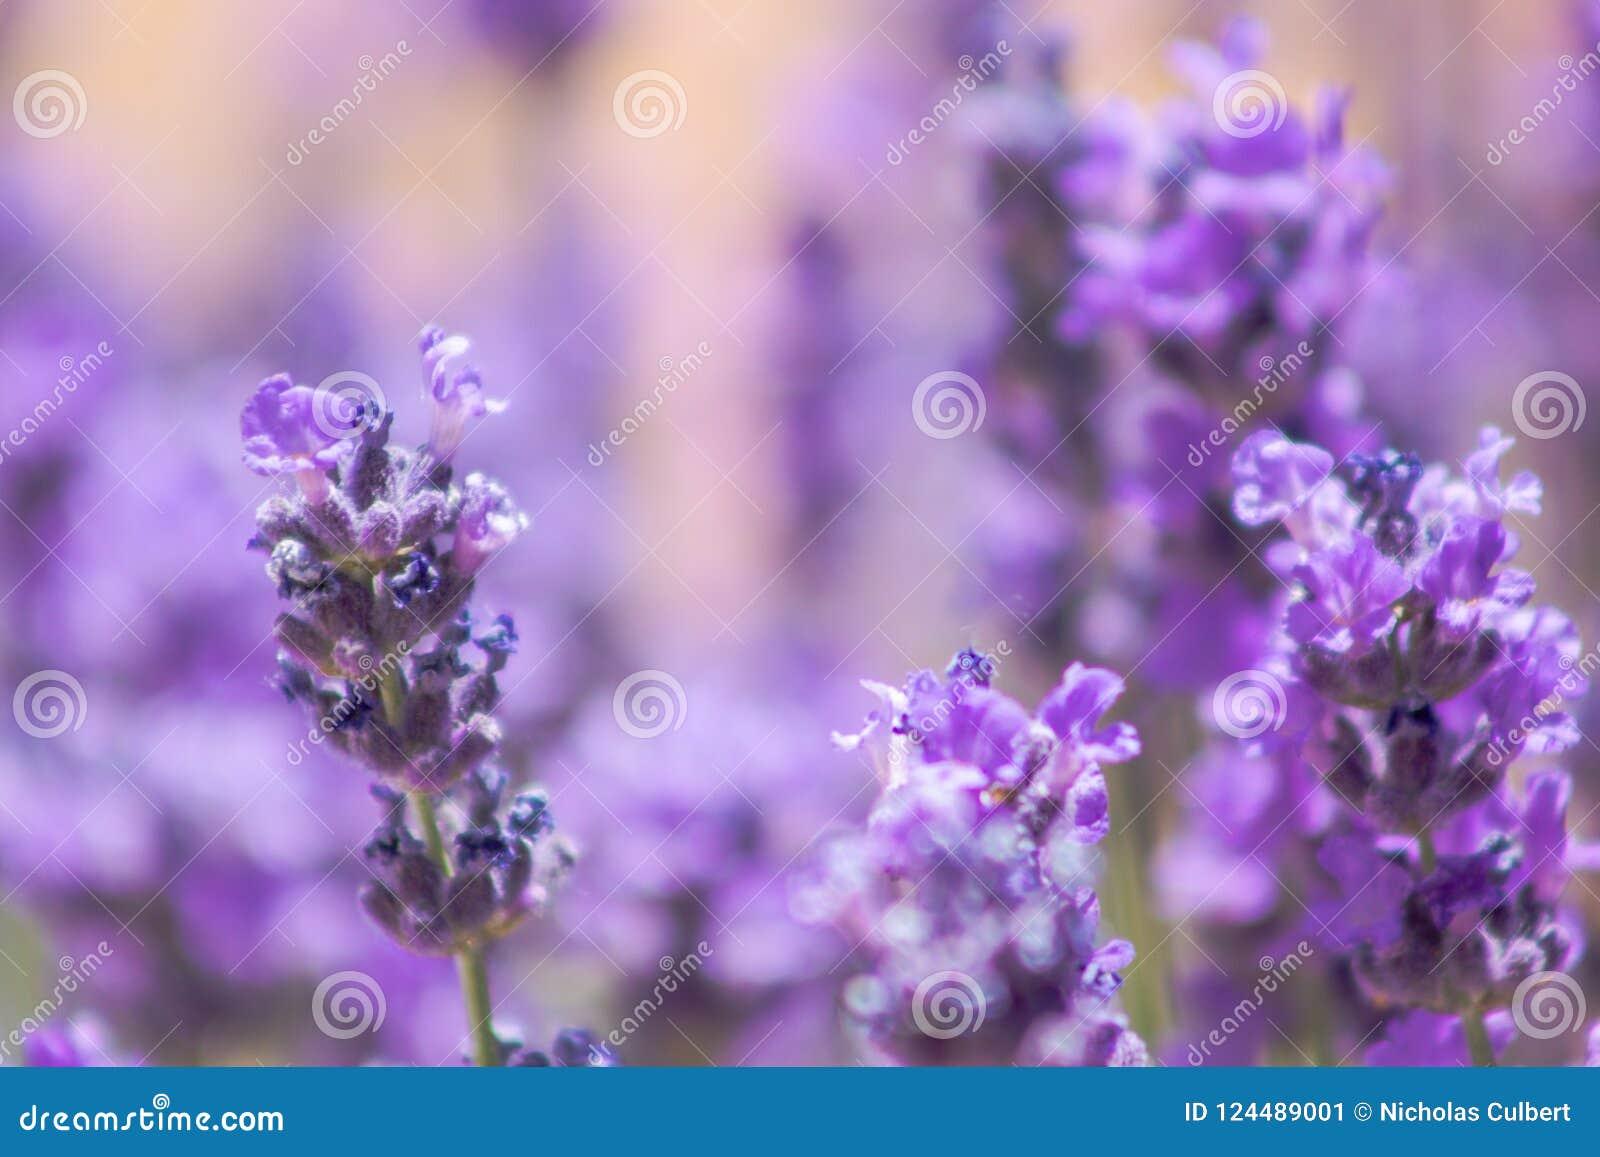 Purple Flowers Close Up On Light Orange Background Stock Image